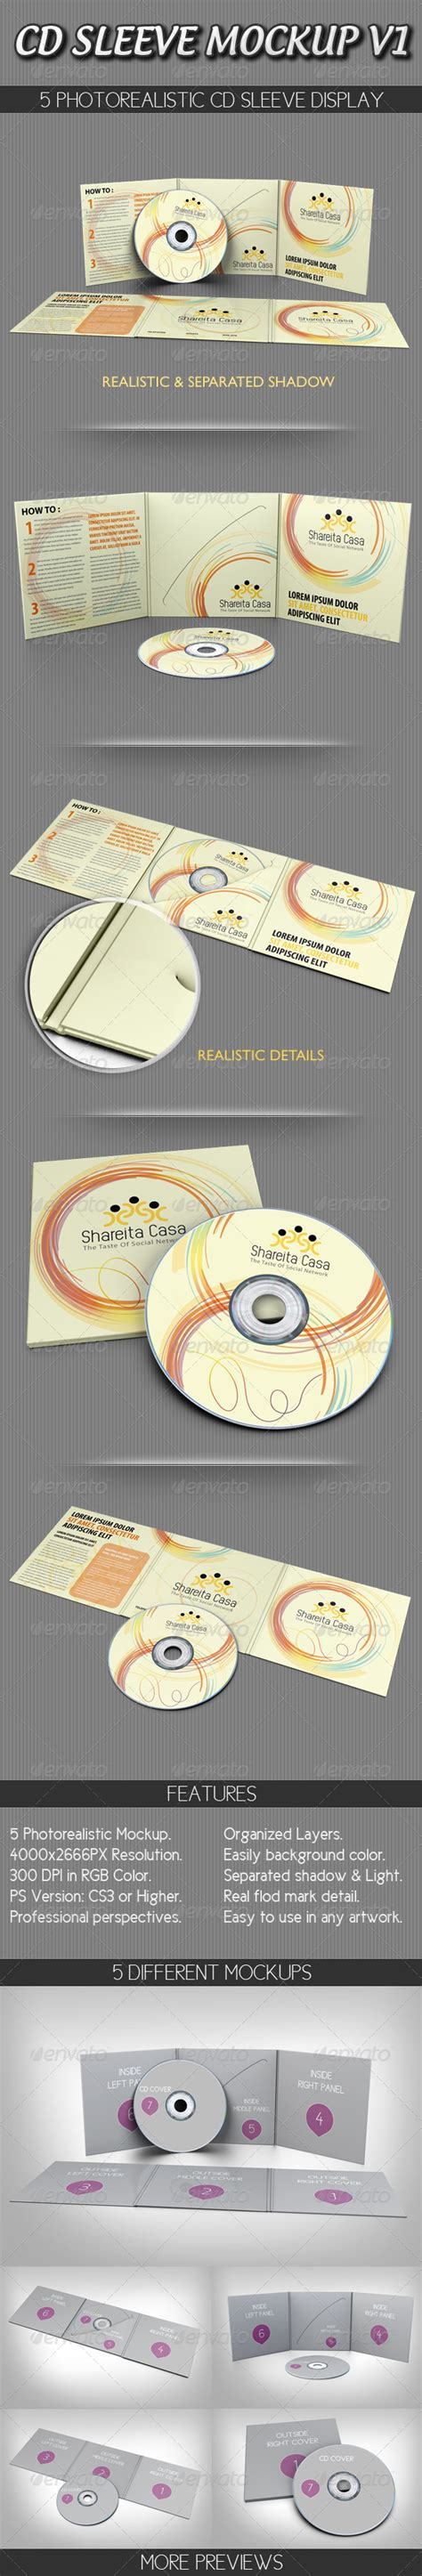 sleeve tattoo mockup cd sleeve mockup v1 graphicriver